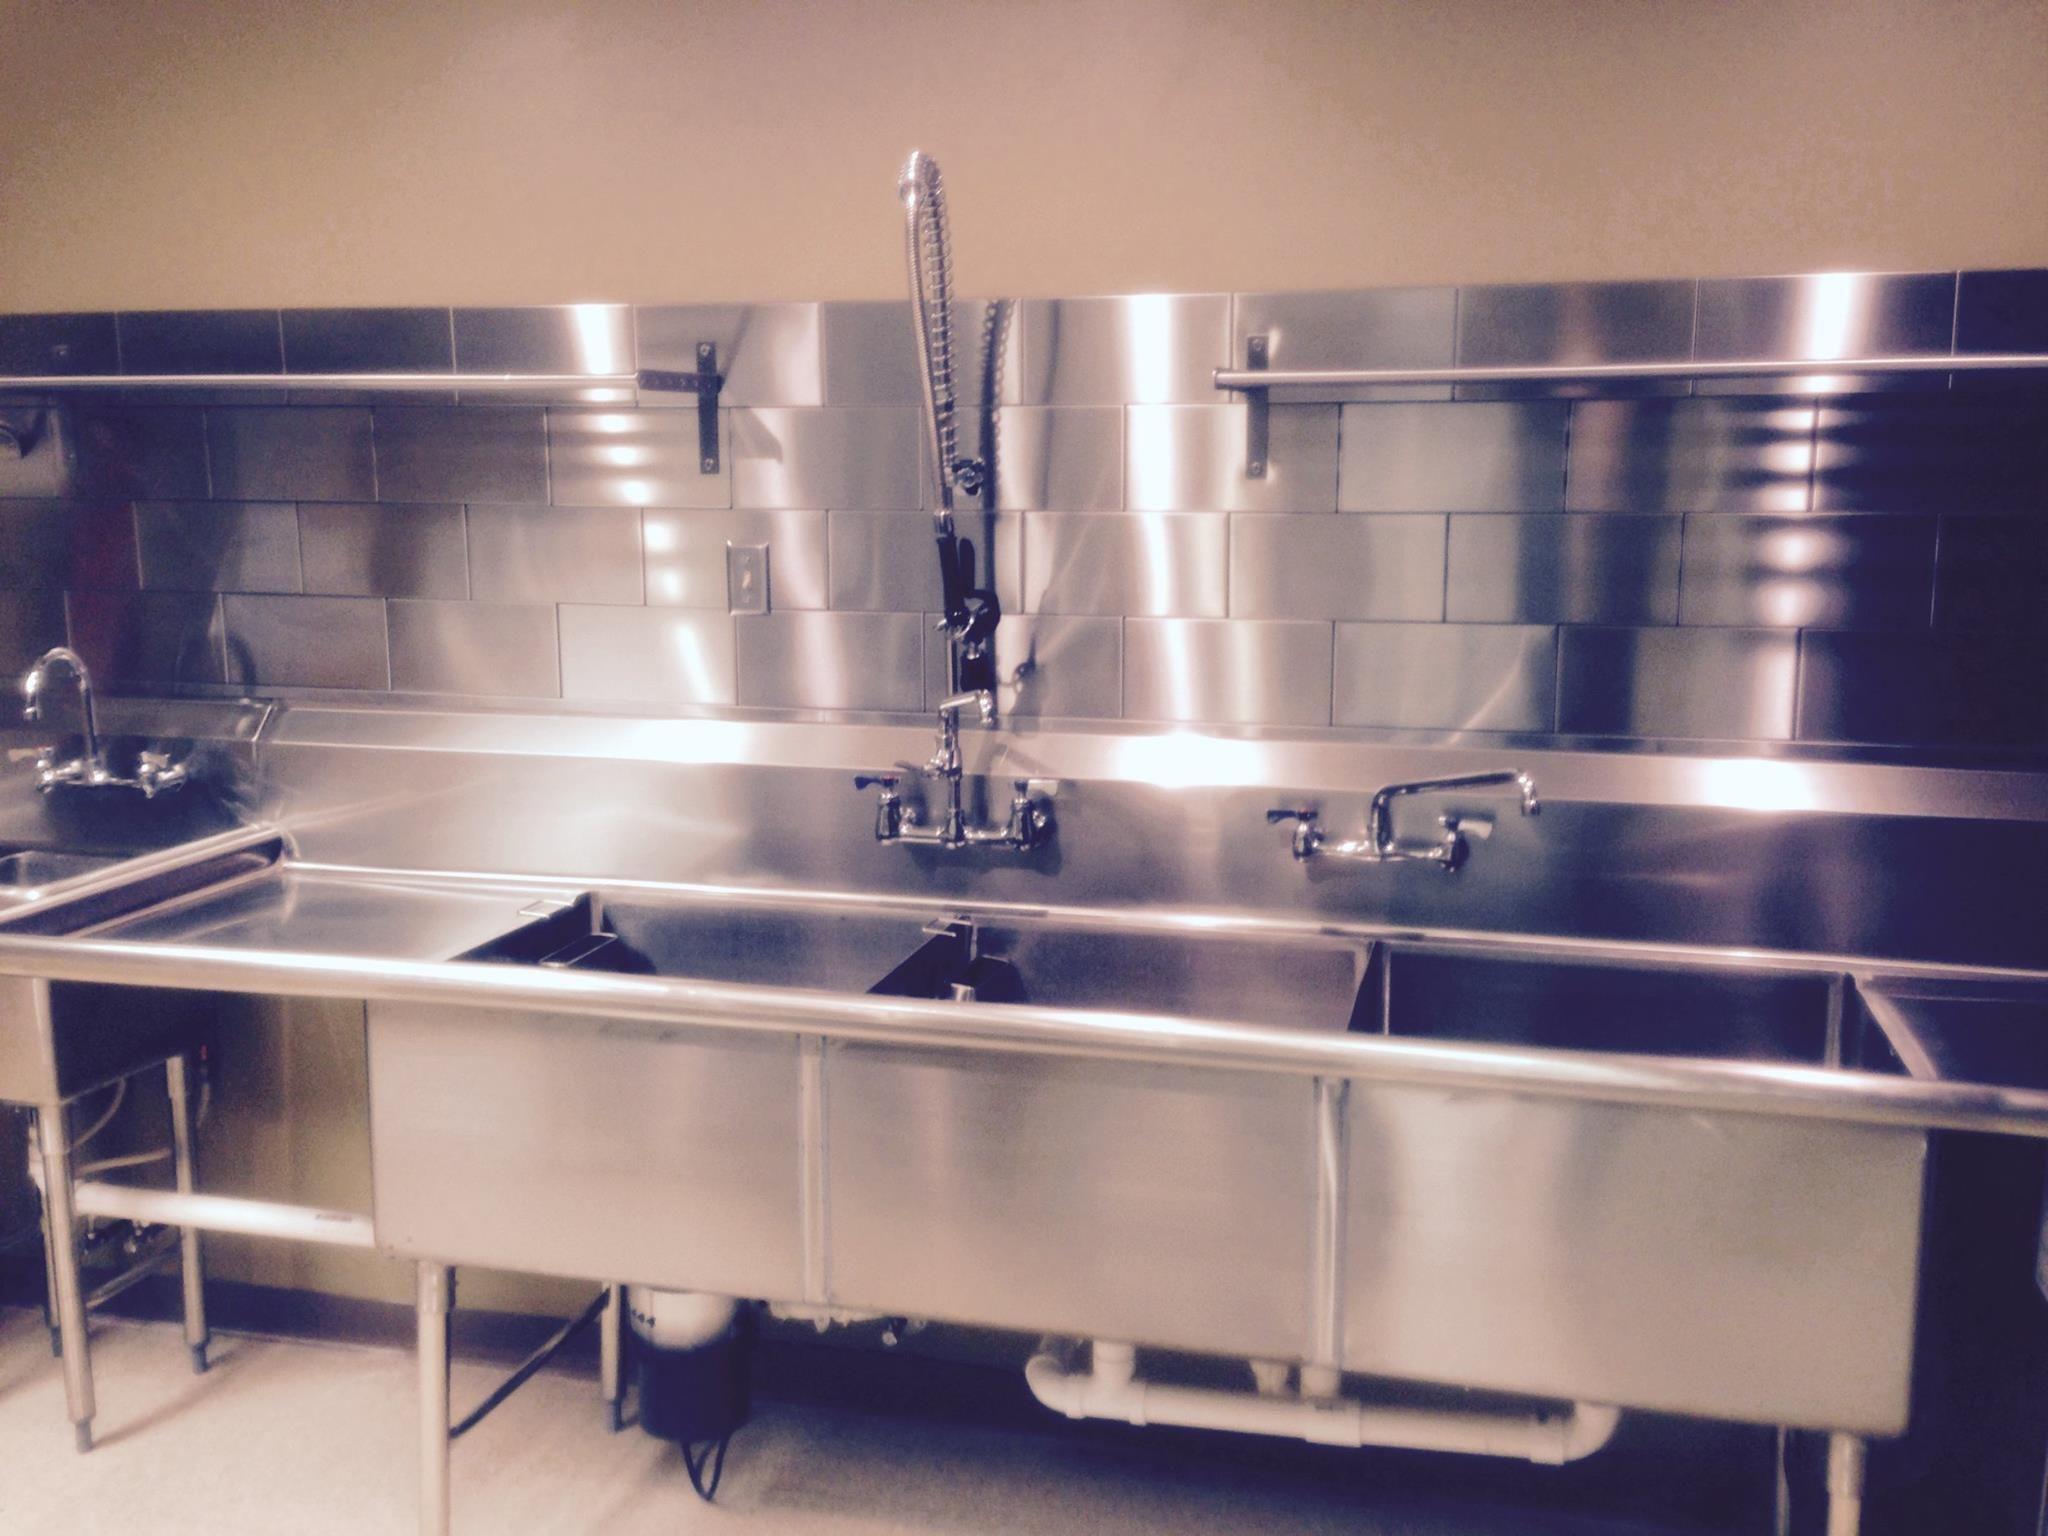 Stainless Steel Tile Restaurant Kitchen Design Industrial